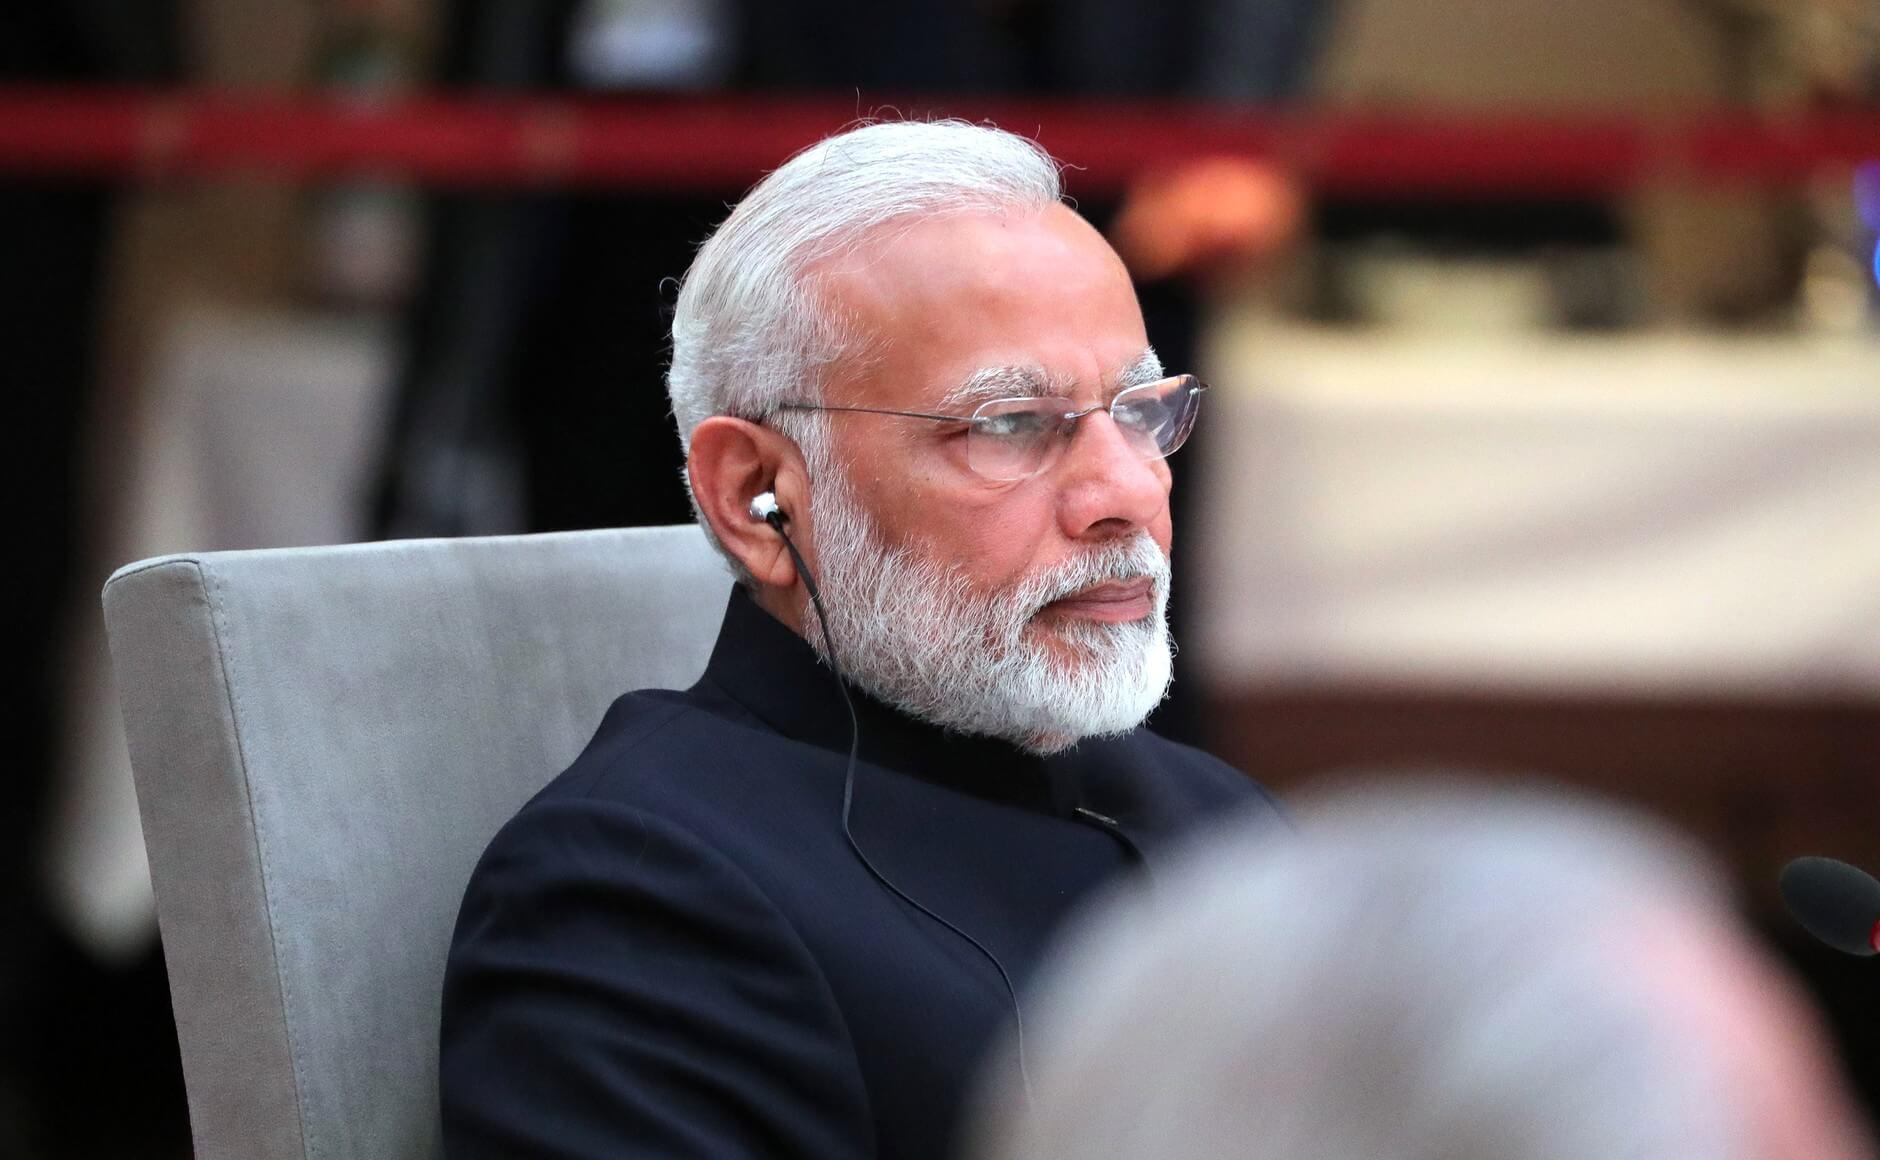 Narendra_Modi_ politics cases india